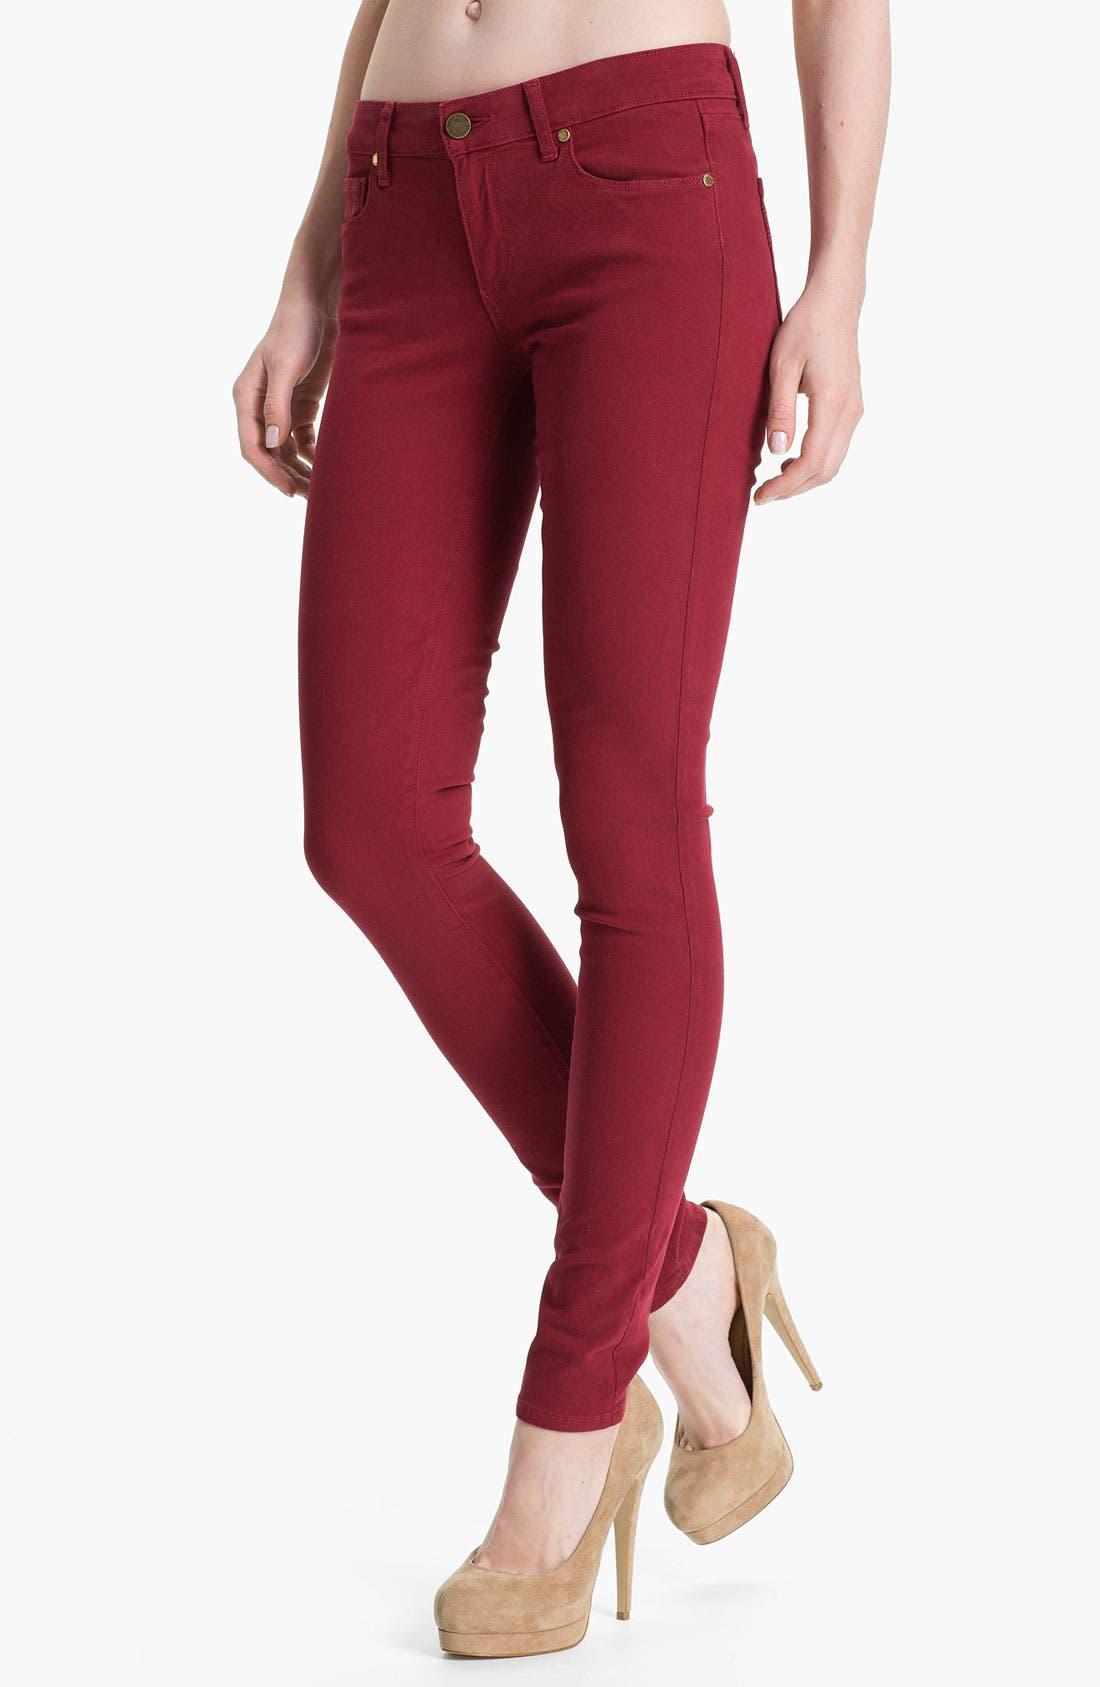 Alternate Image 1 Selected - Paige Denim 'Verdugo' Skinny Stretch Denim Jeans (Cardinal)